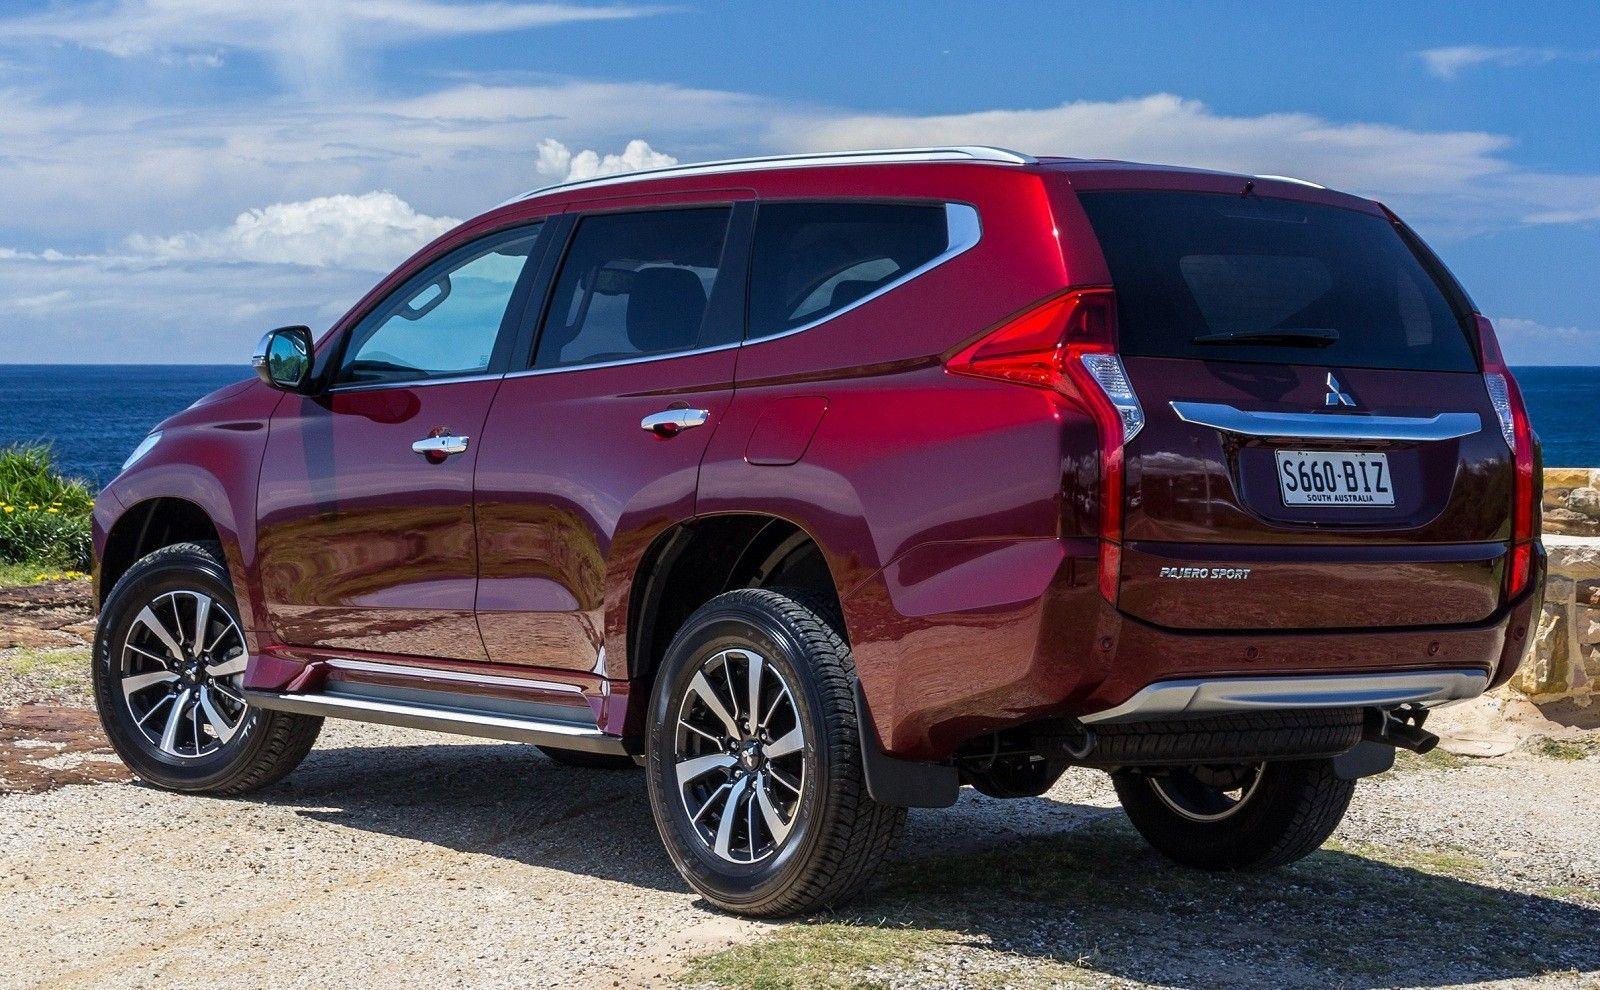 2019 Mitsubishi Sports Specs and Review Mitsubishi